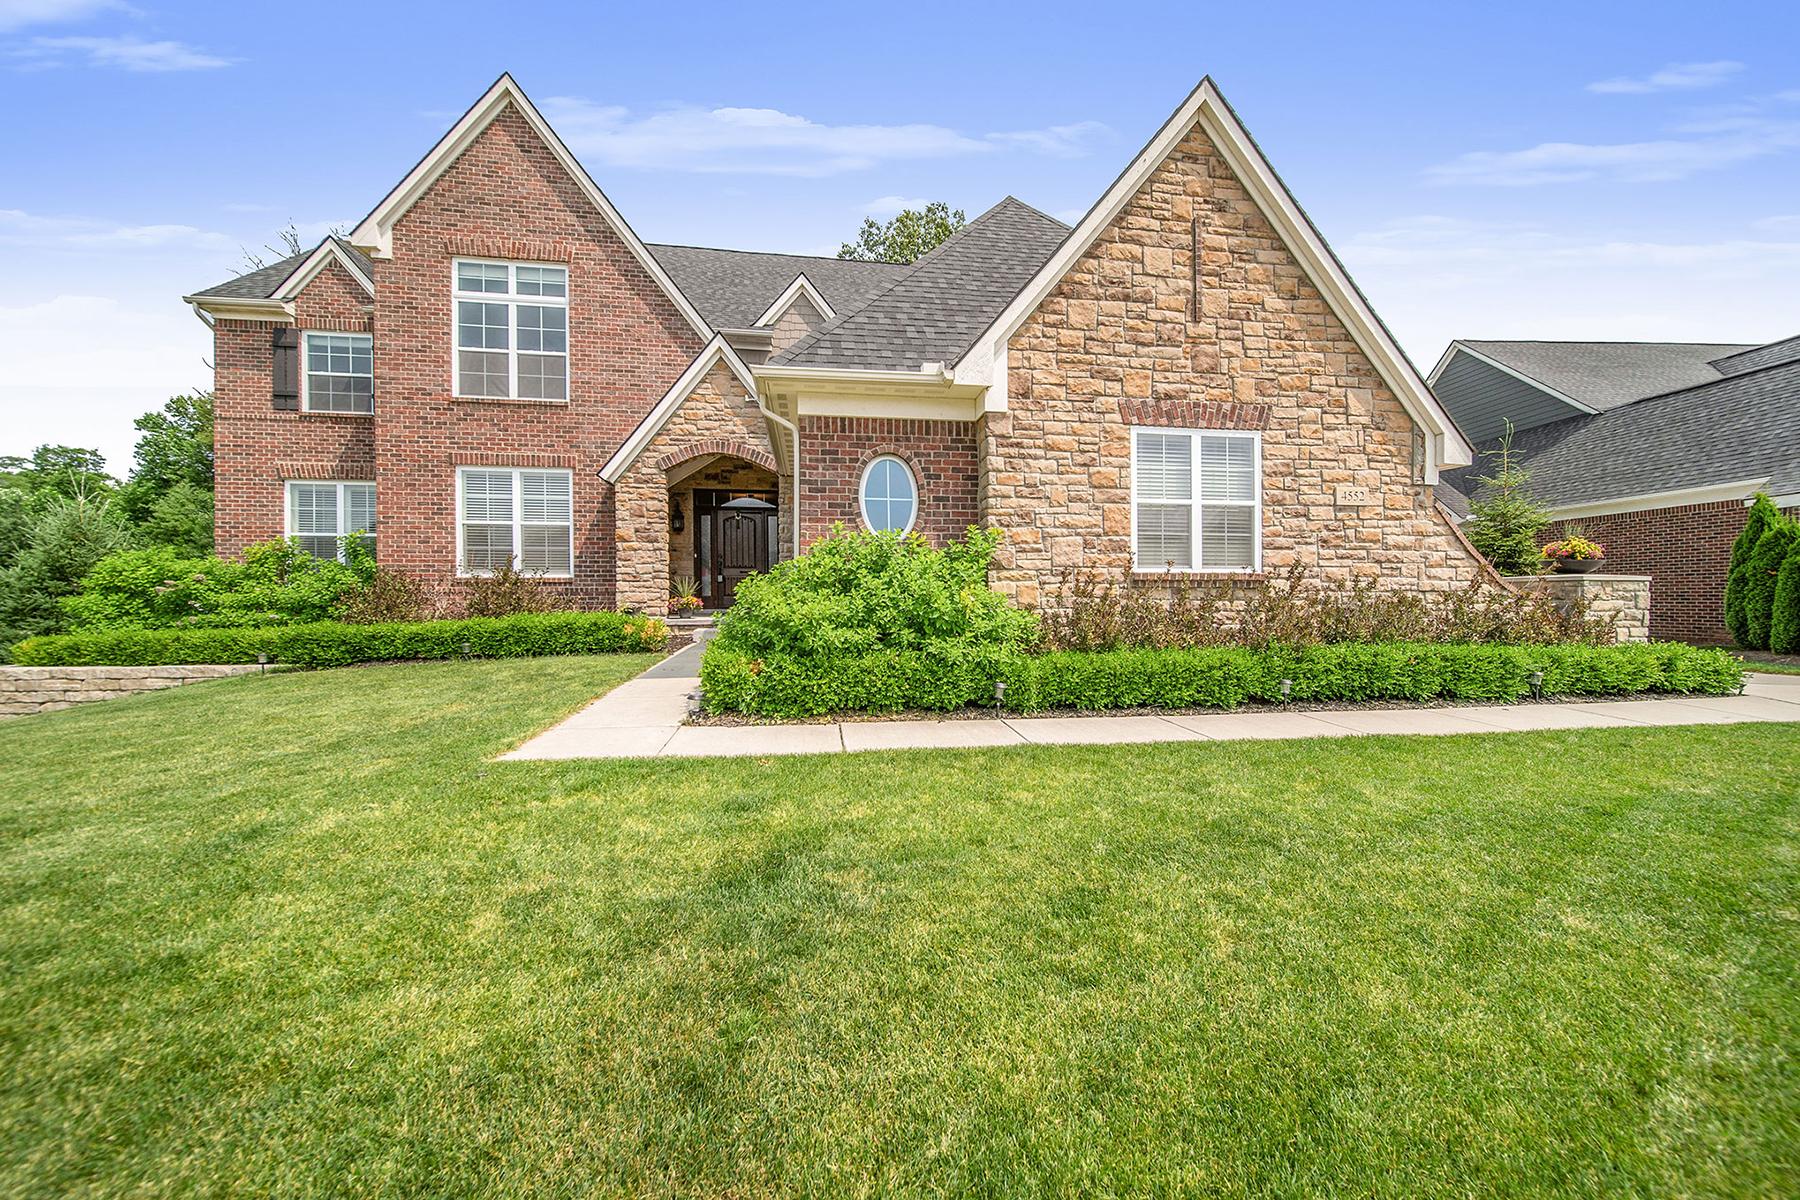 Single Family Homes for Sale at Clarkston 4552 Oakhurst Ridge Road Clarkston, Michigan 48348 United States